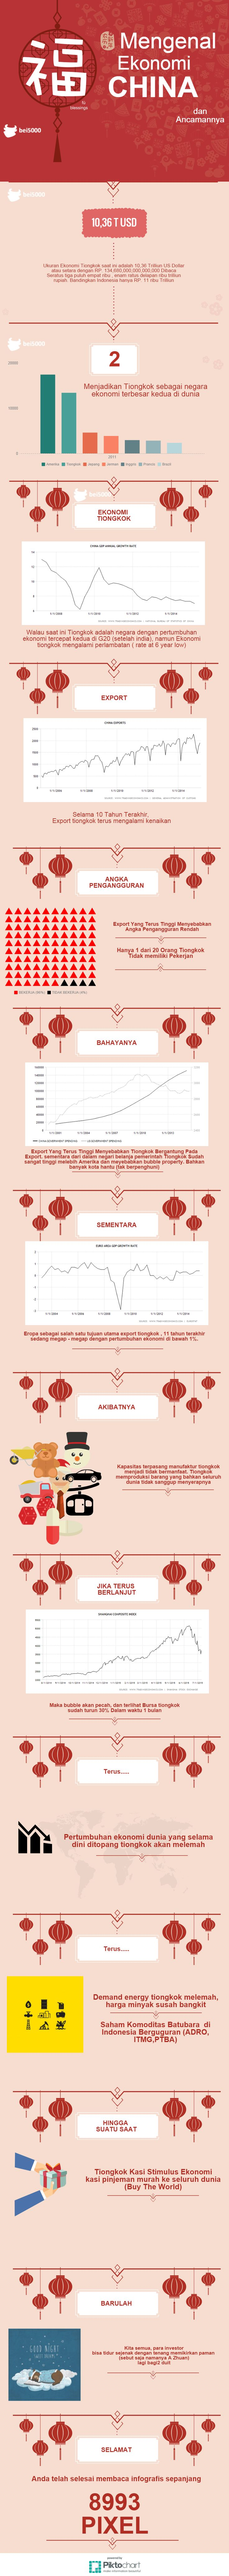 Mengenal Ekonomi China dan Ancamannya